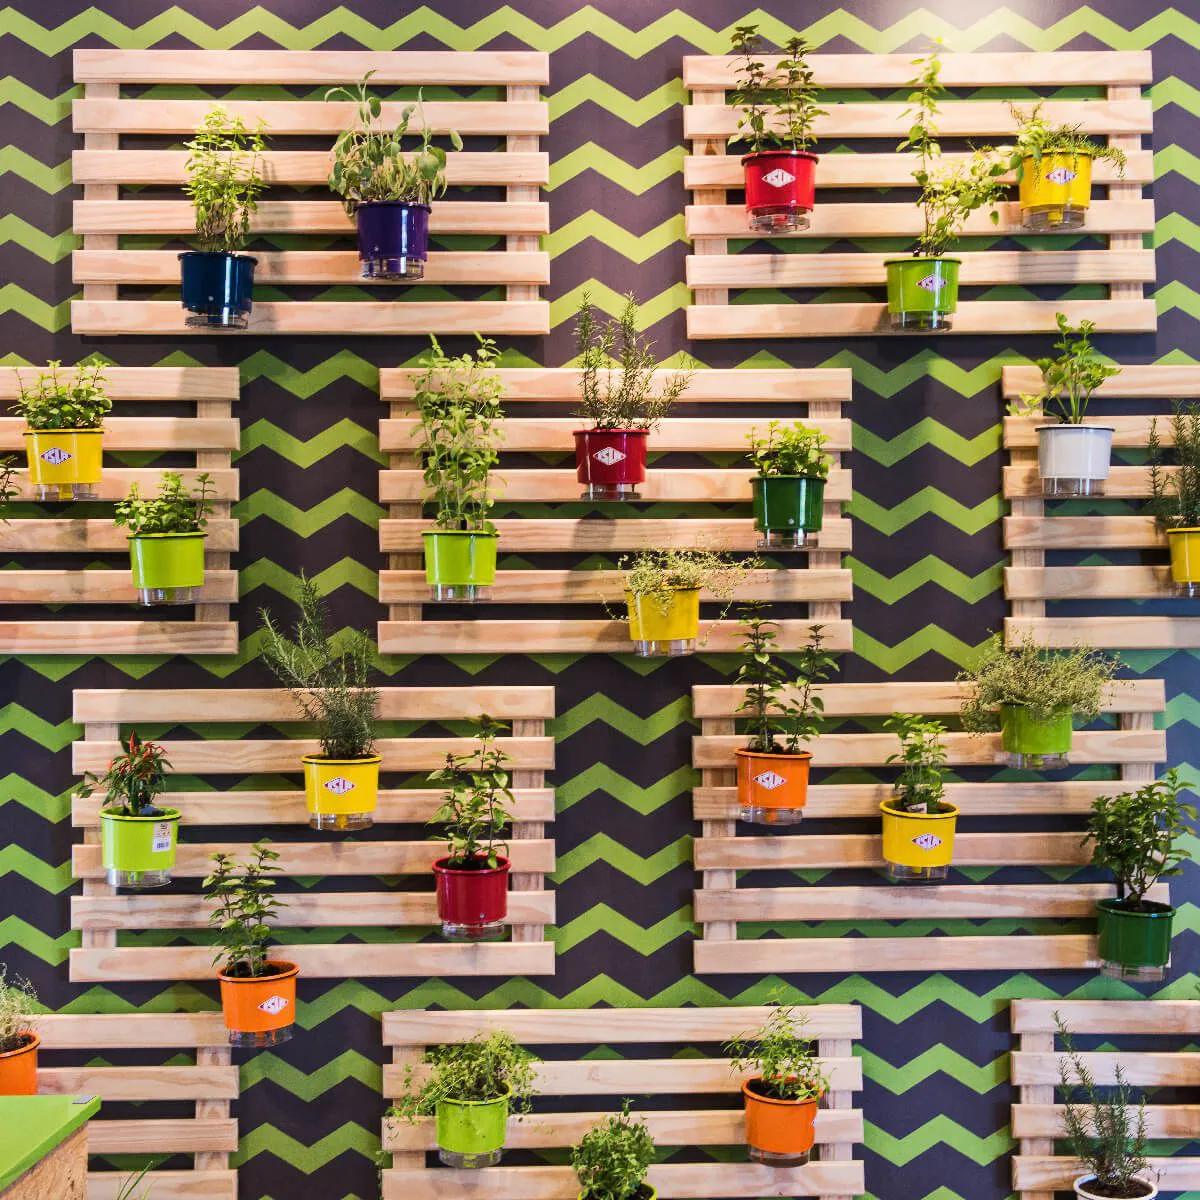 Kit 7 Vasos Raiz Coloridos Rainbow tamanho pequeno N02 12cm x 11cm  - Vasos Raiz Loja Oficial